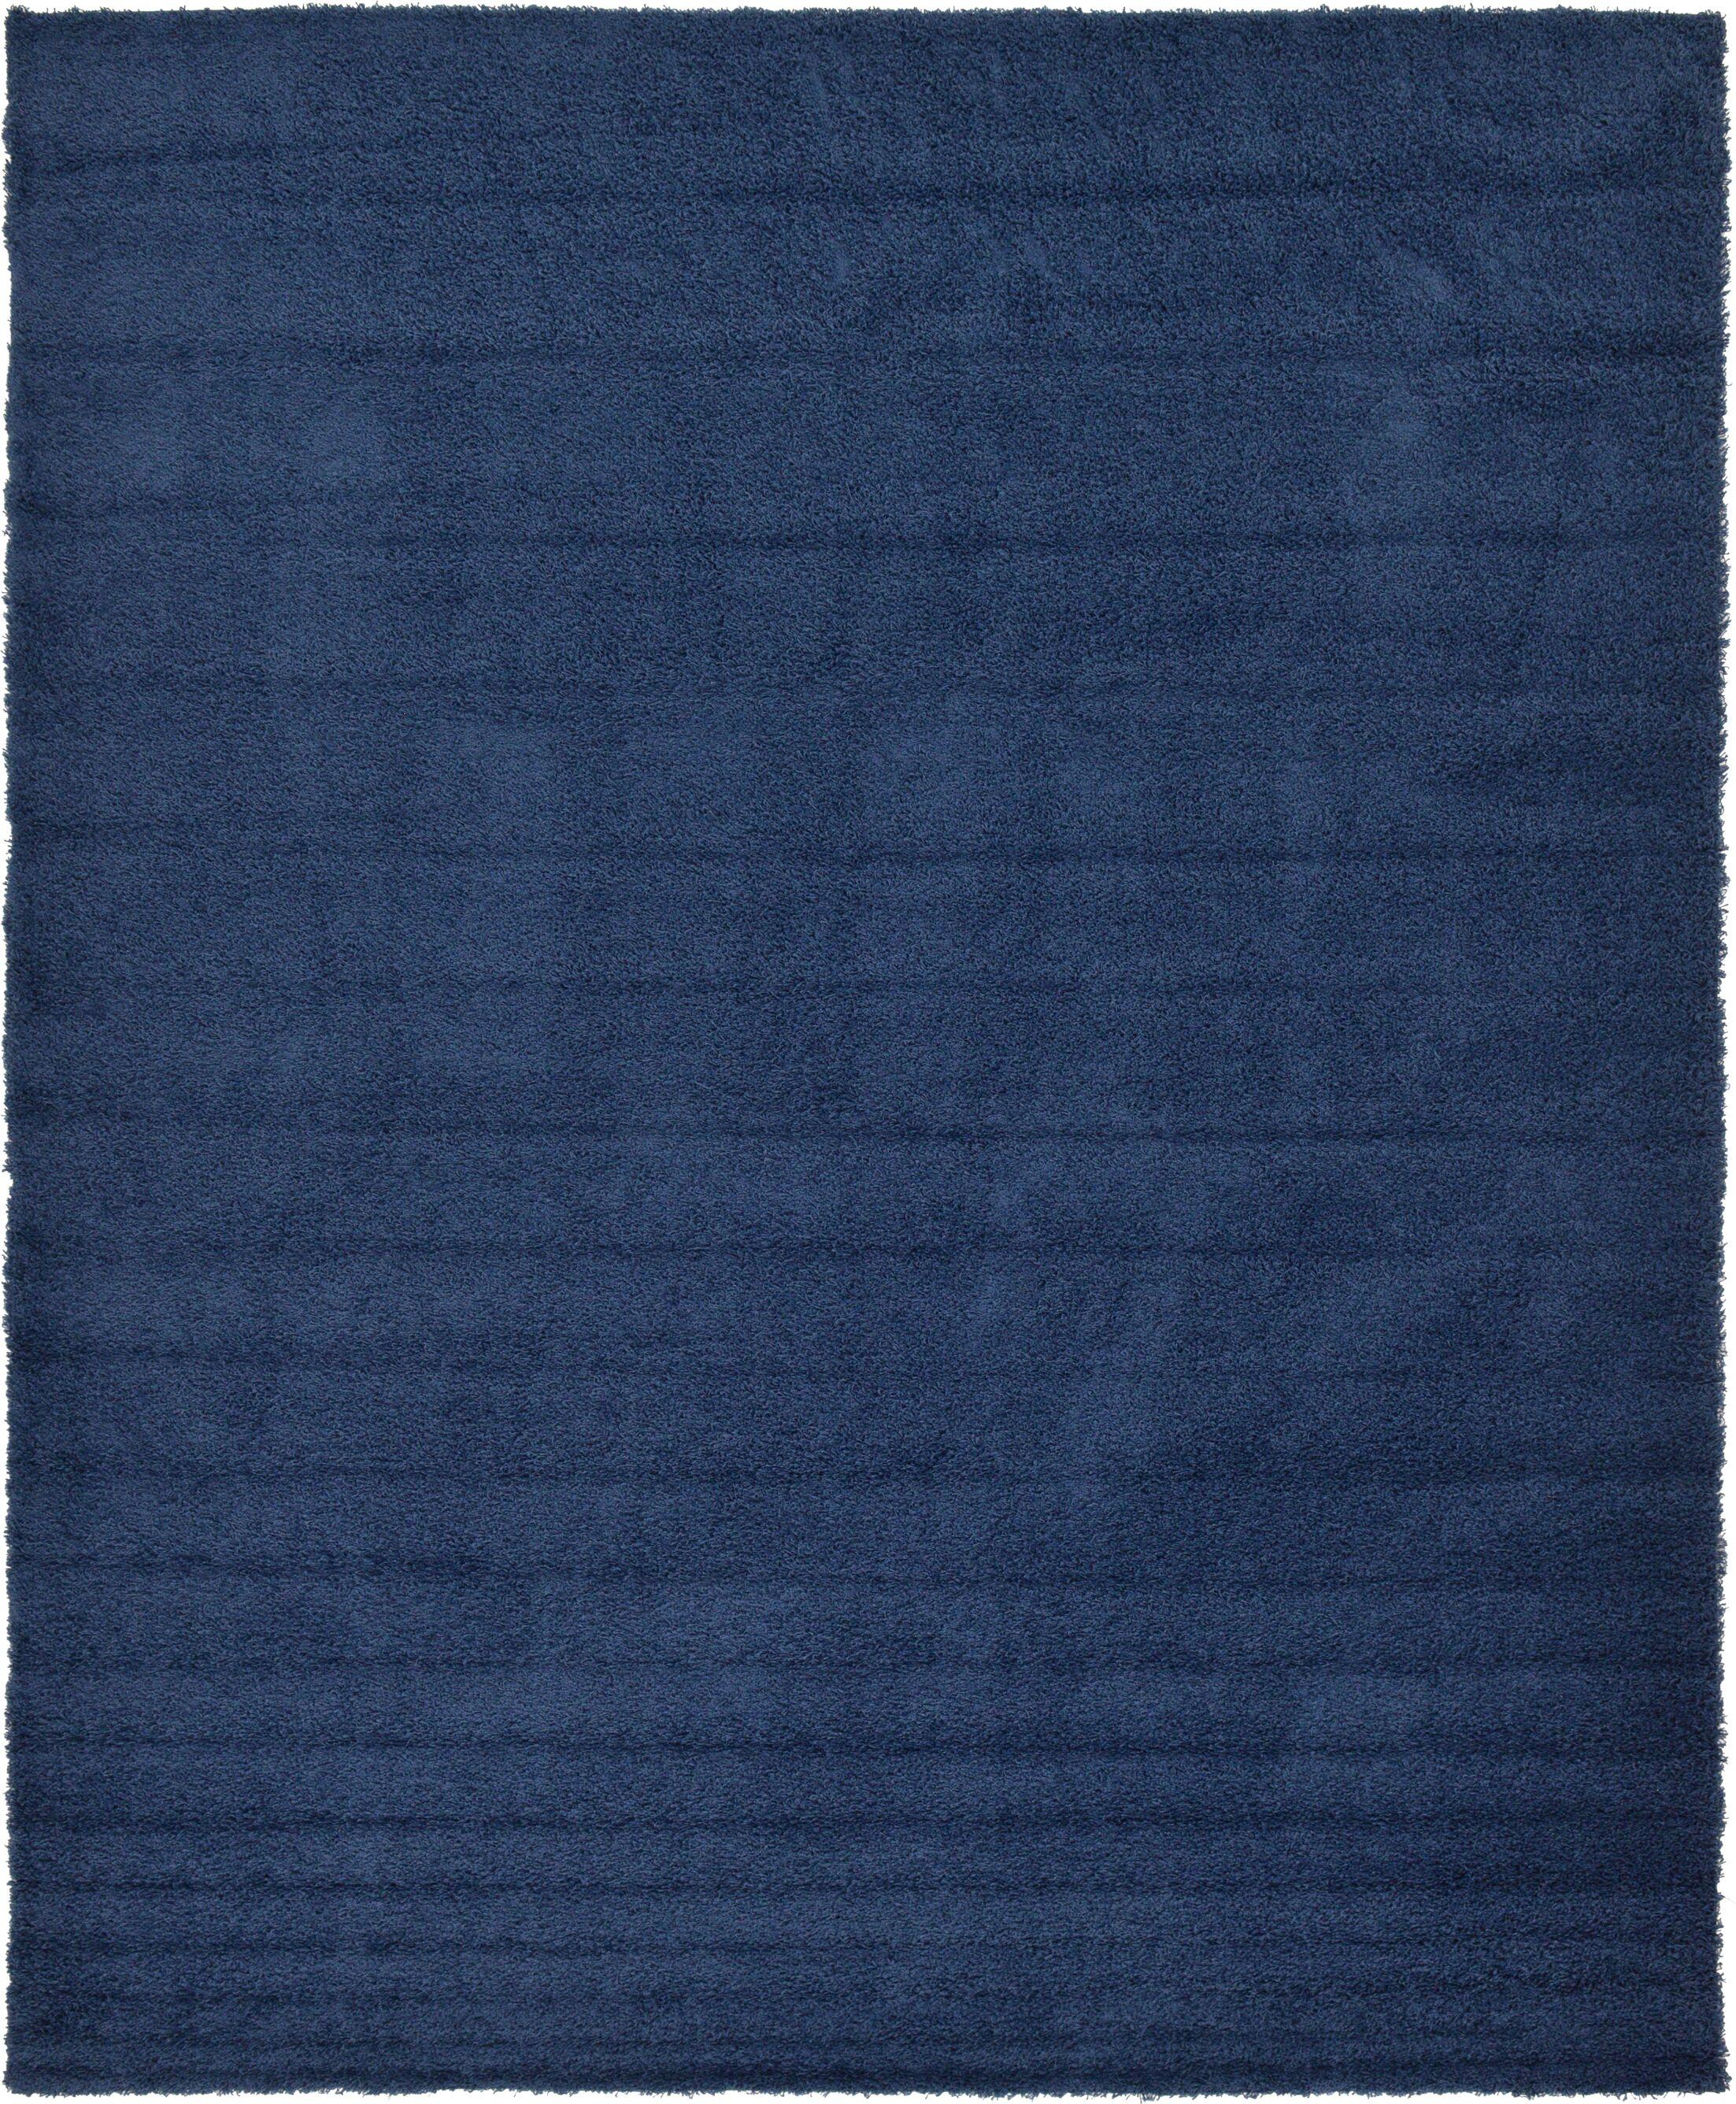 Falmouth Sapphire Area Rug Rug Size: Rectangle 12' x 15'